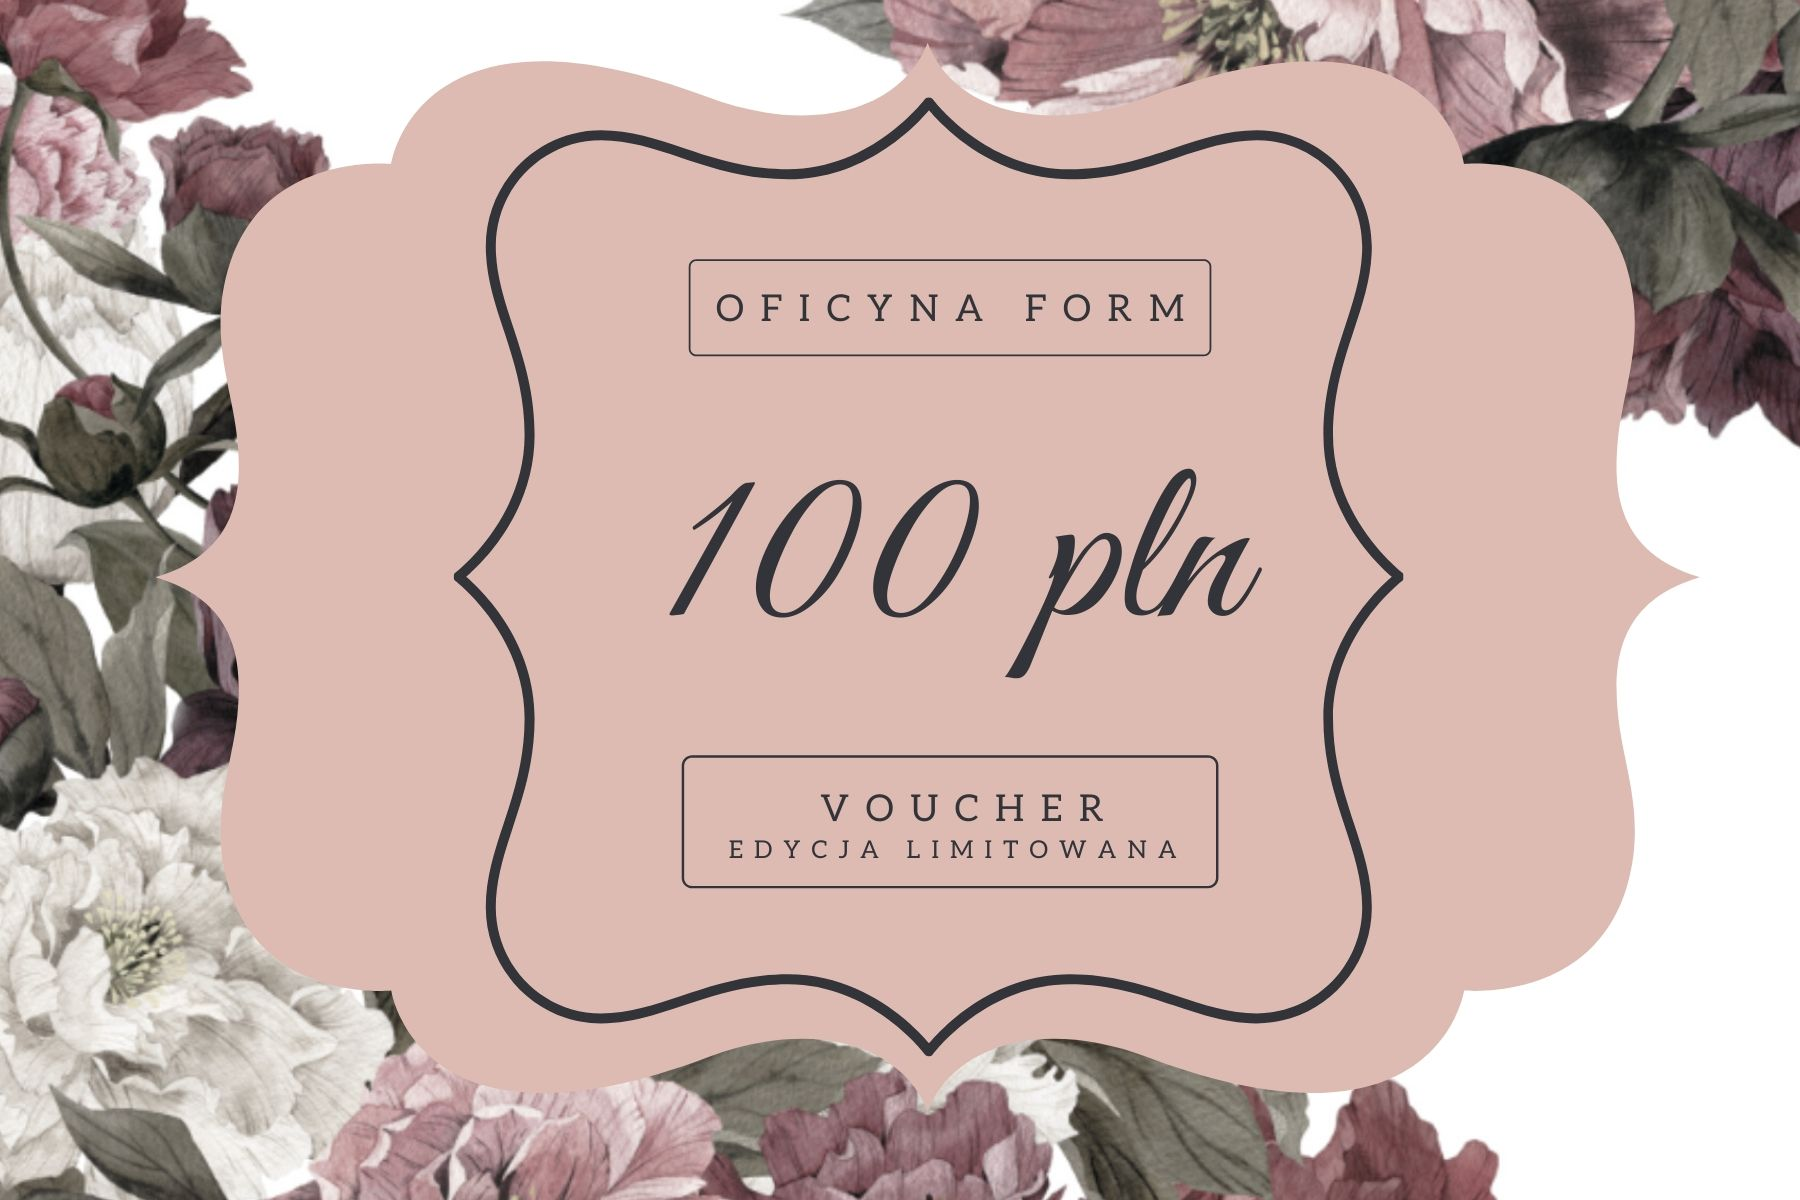 voucher 100 pln Oficyna Form